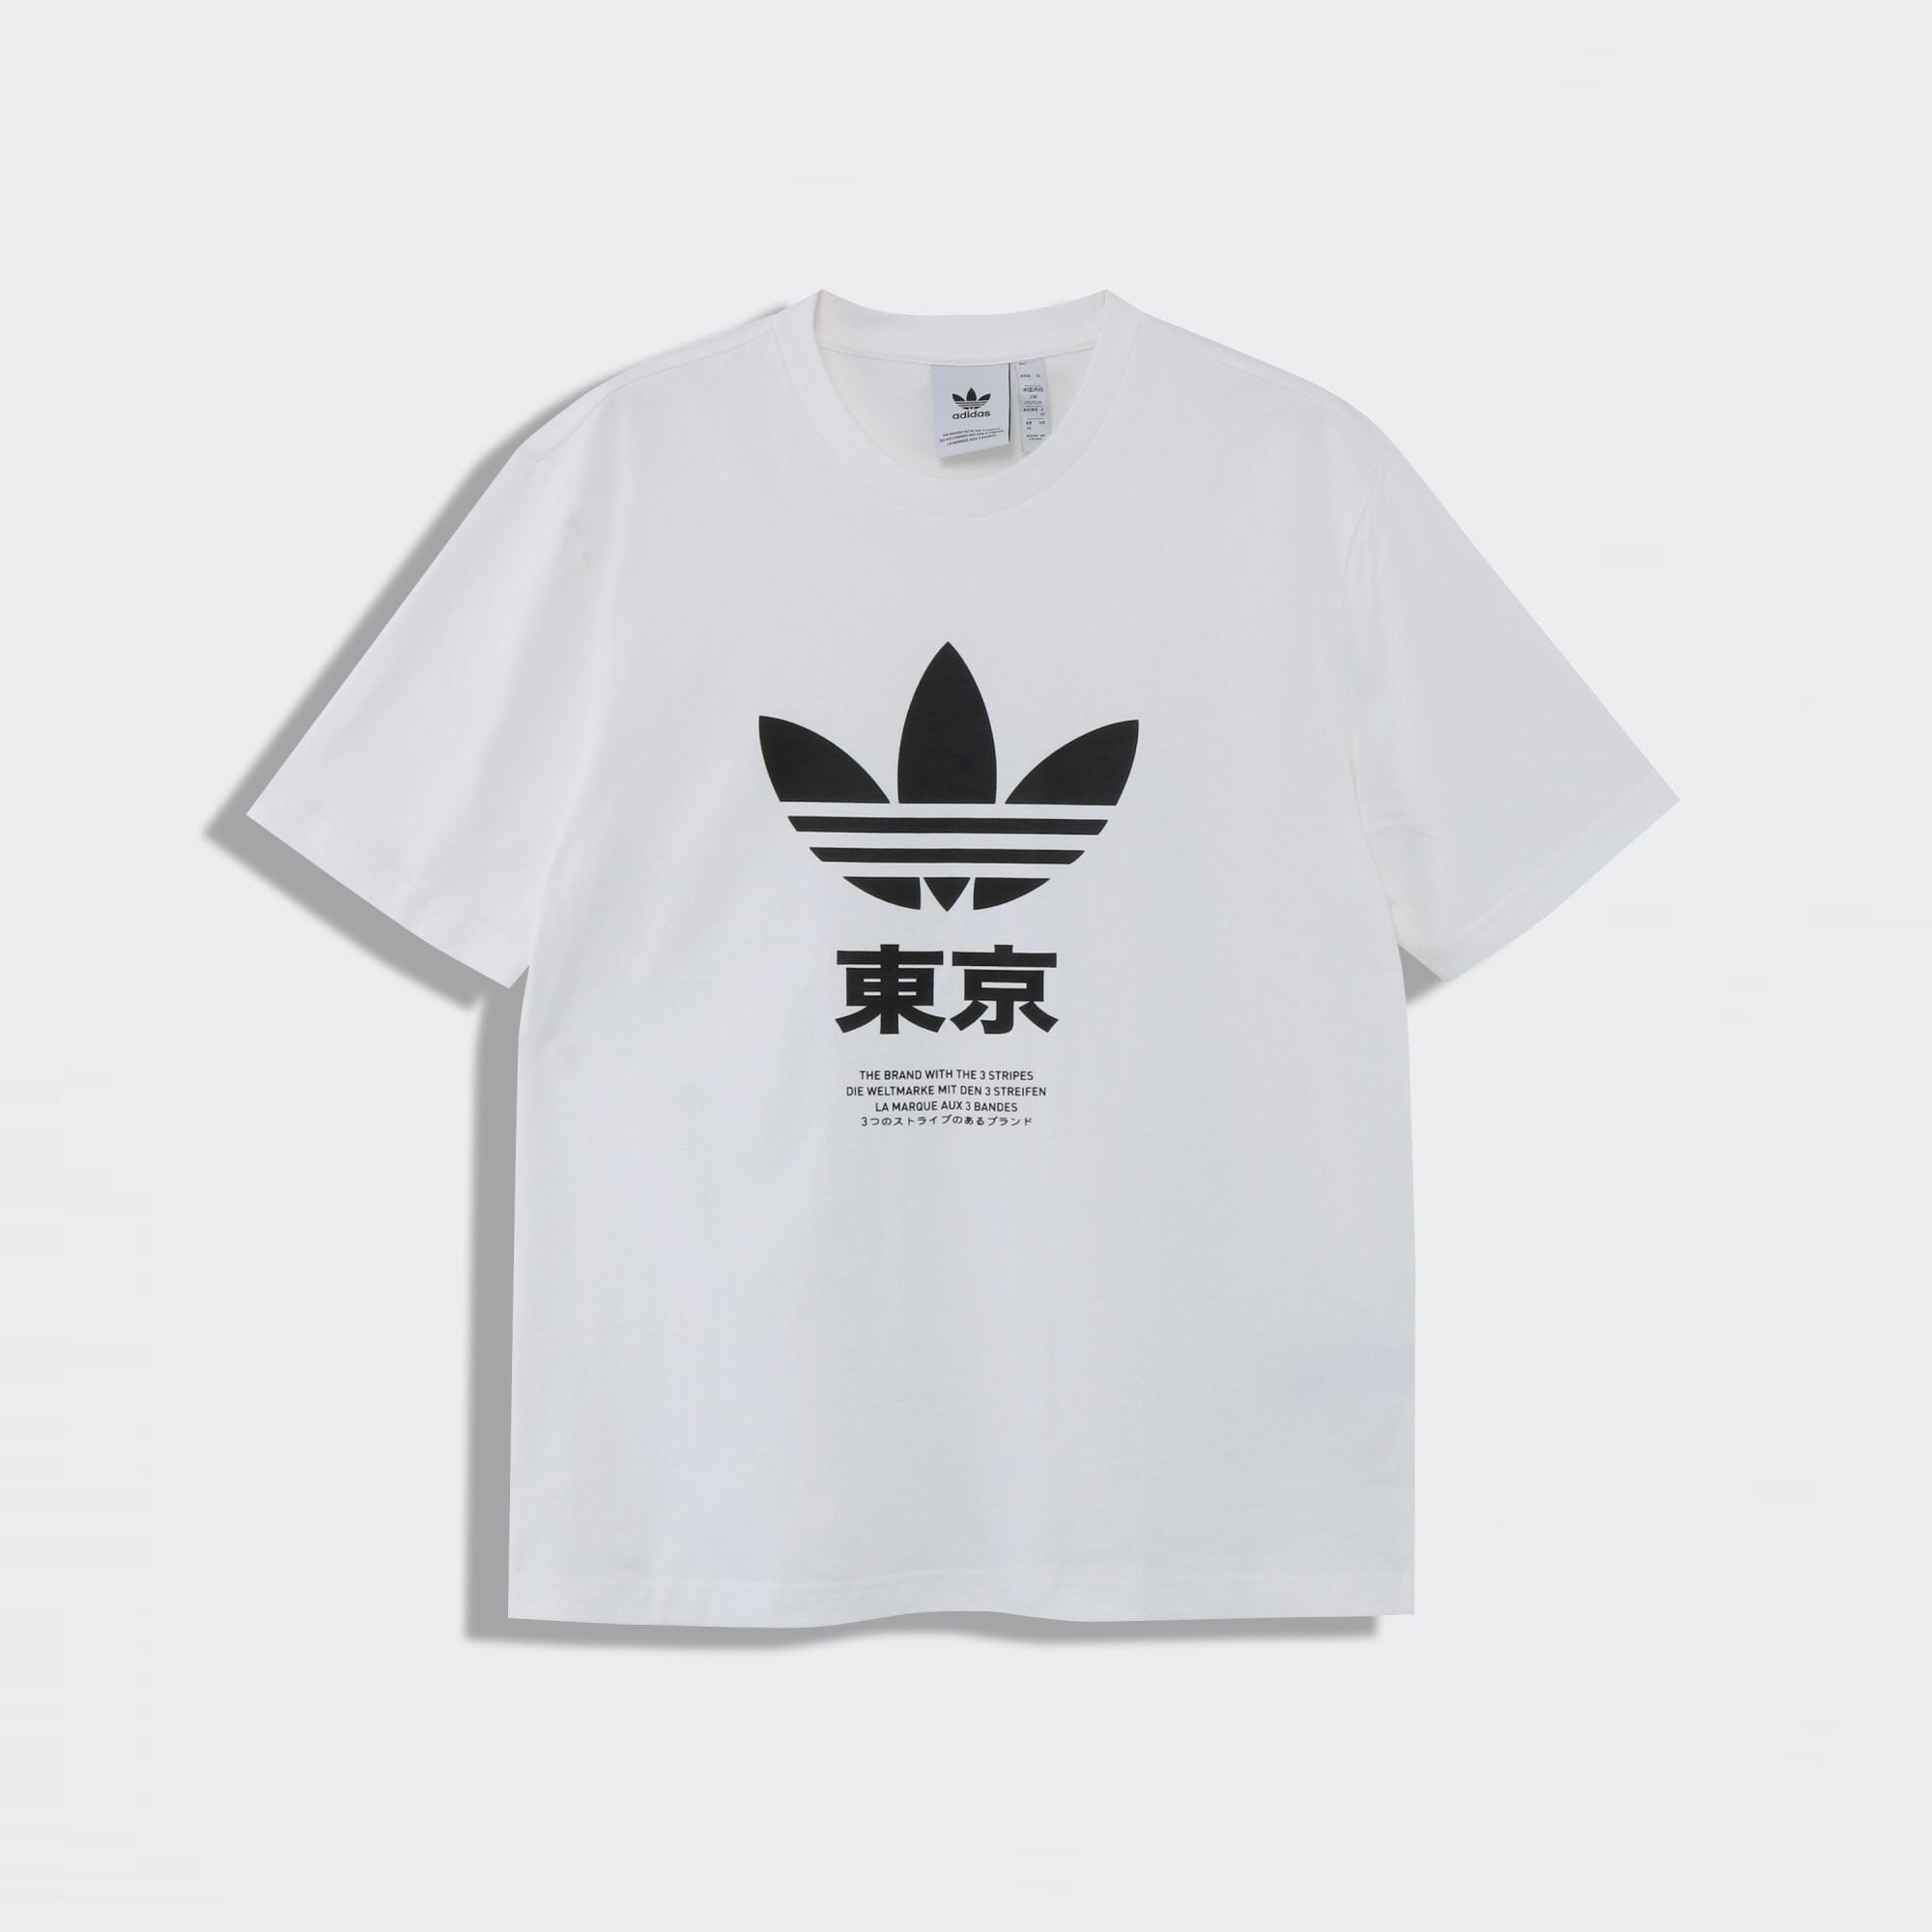 MFT 東京 Tシャツ